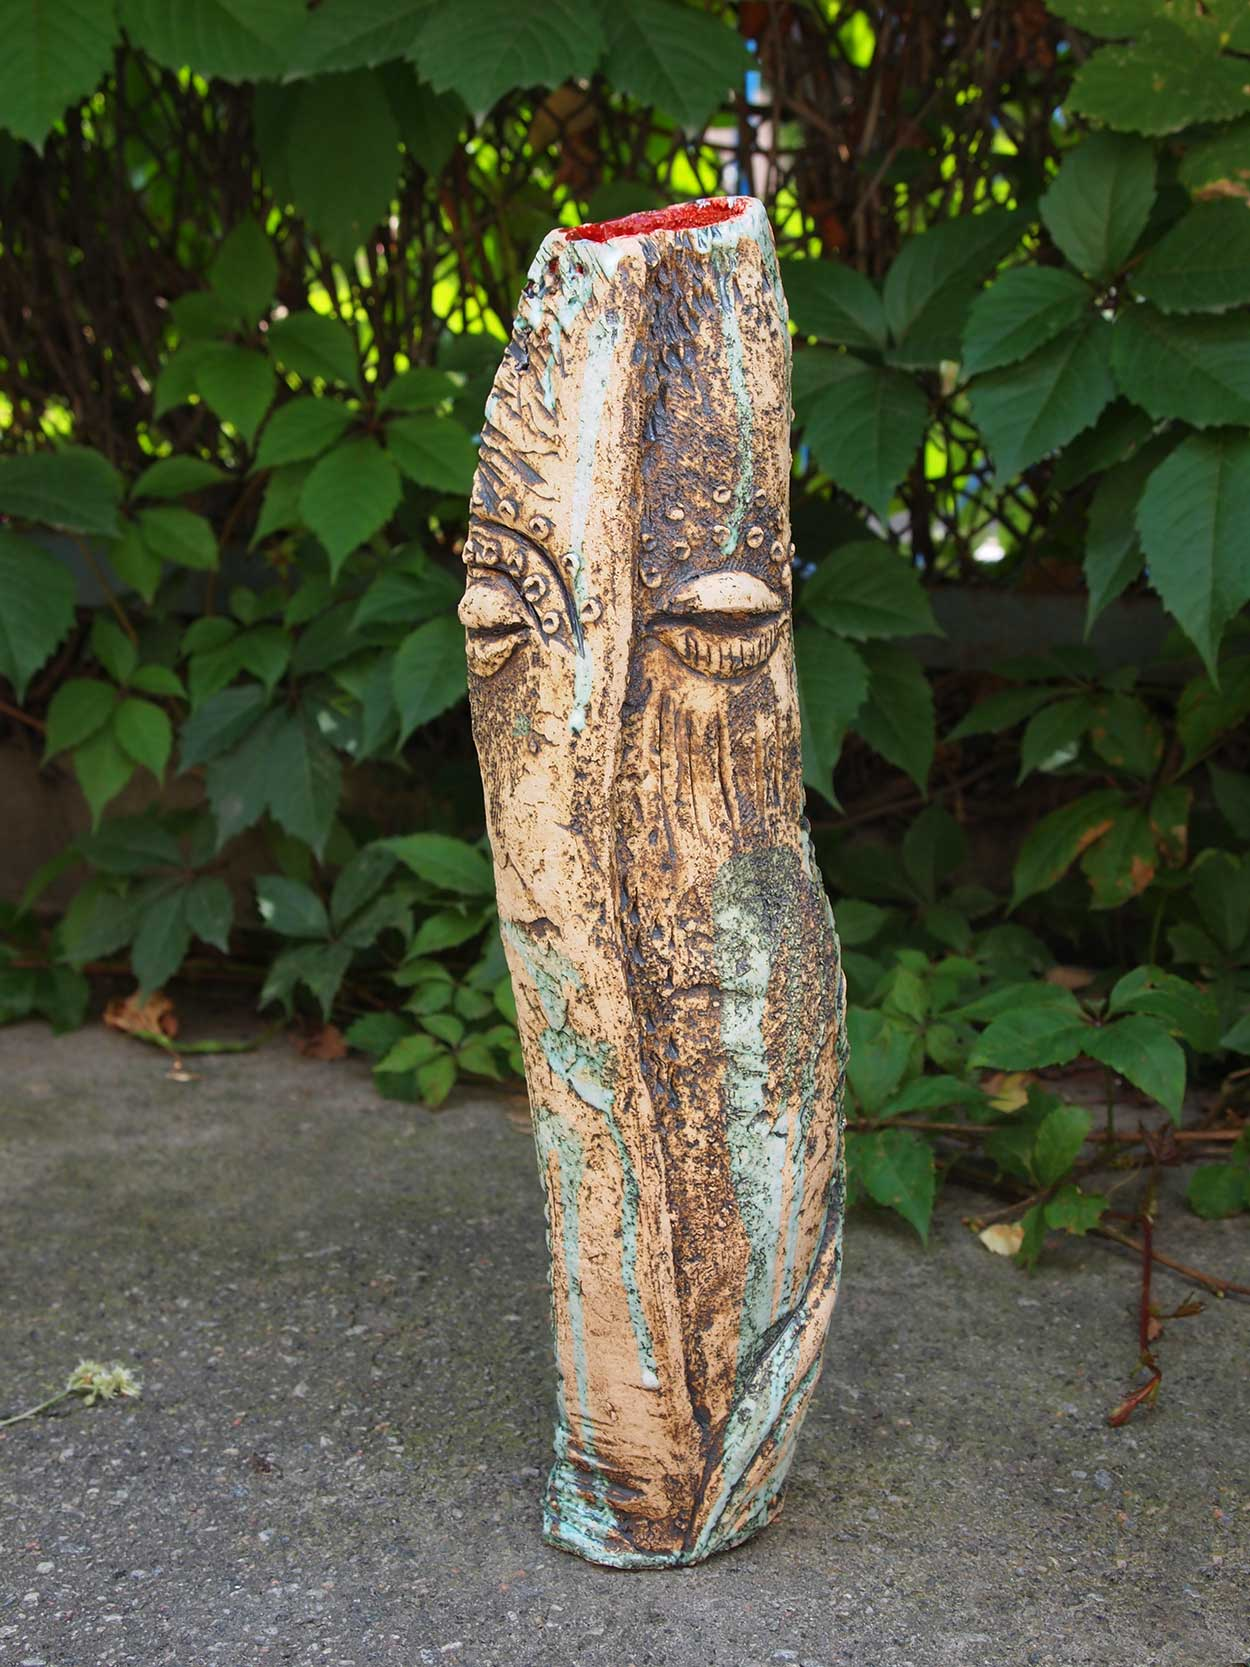 Decorative vase for flowers (Handmade)